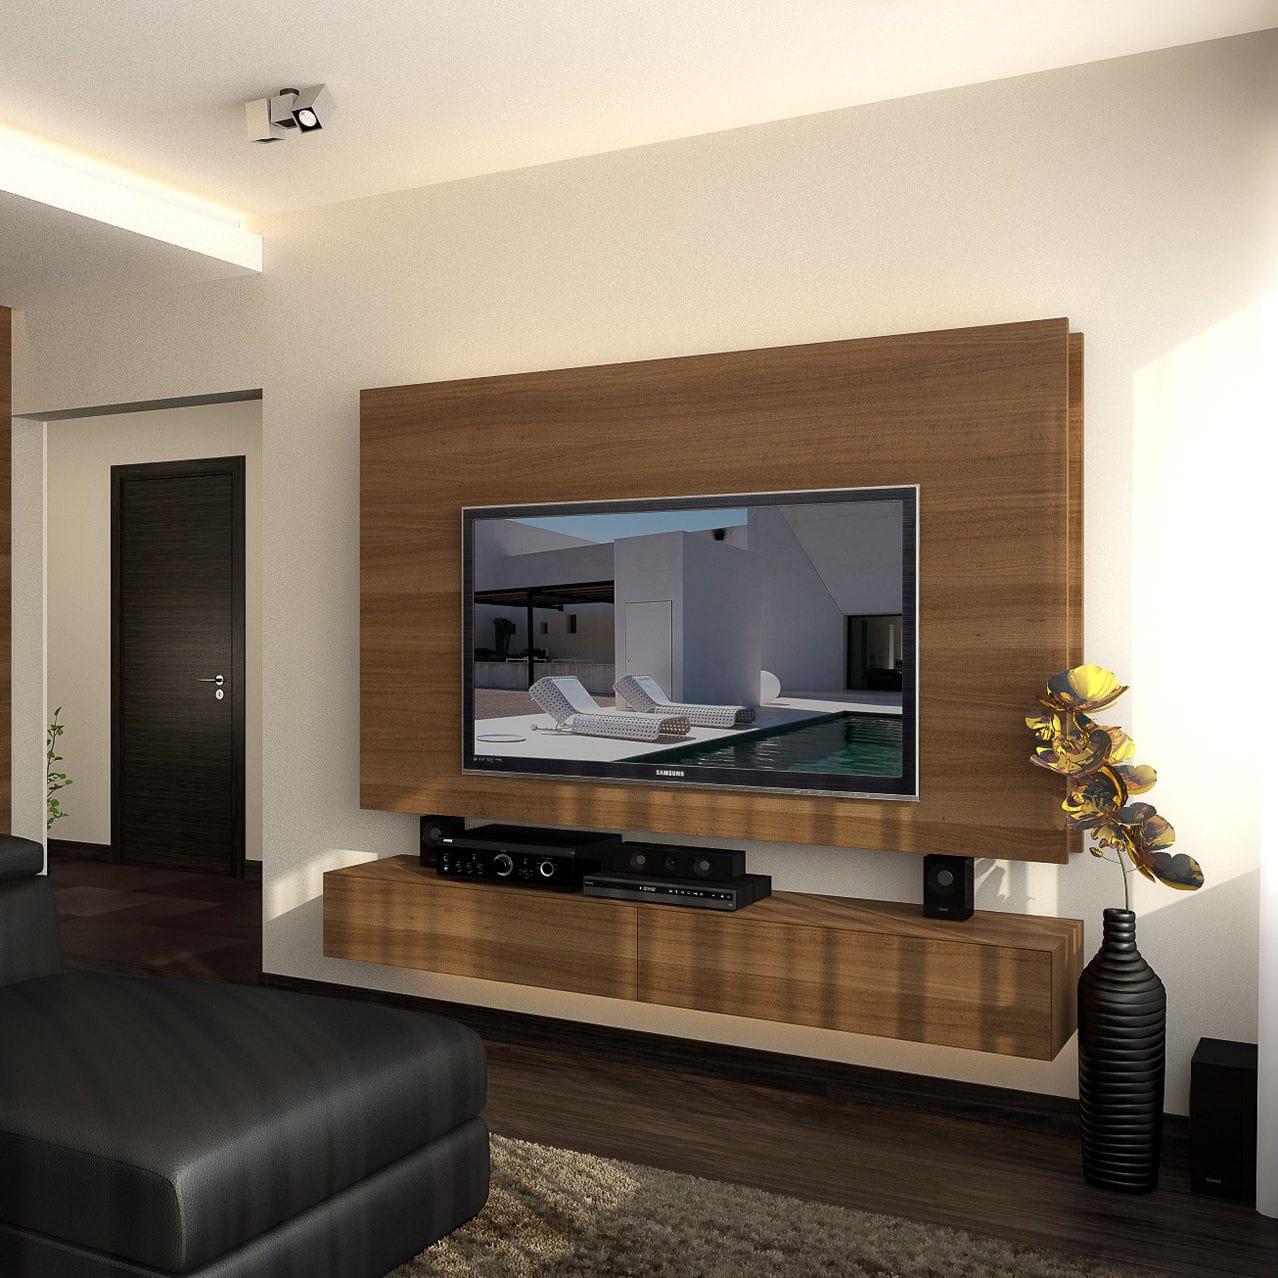 Contemporary Tv Wall Unit In4 Design Ideas Ltd Wooden